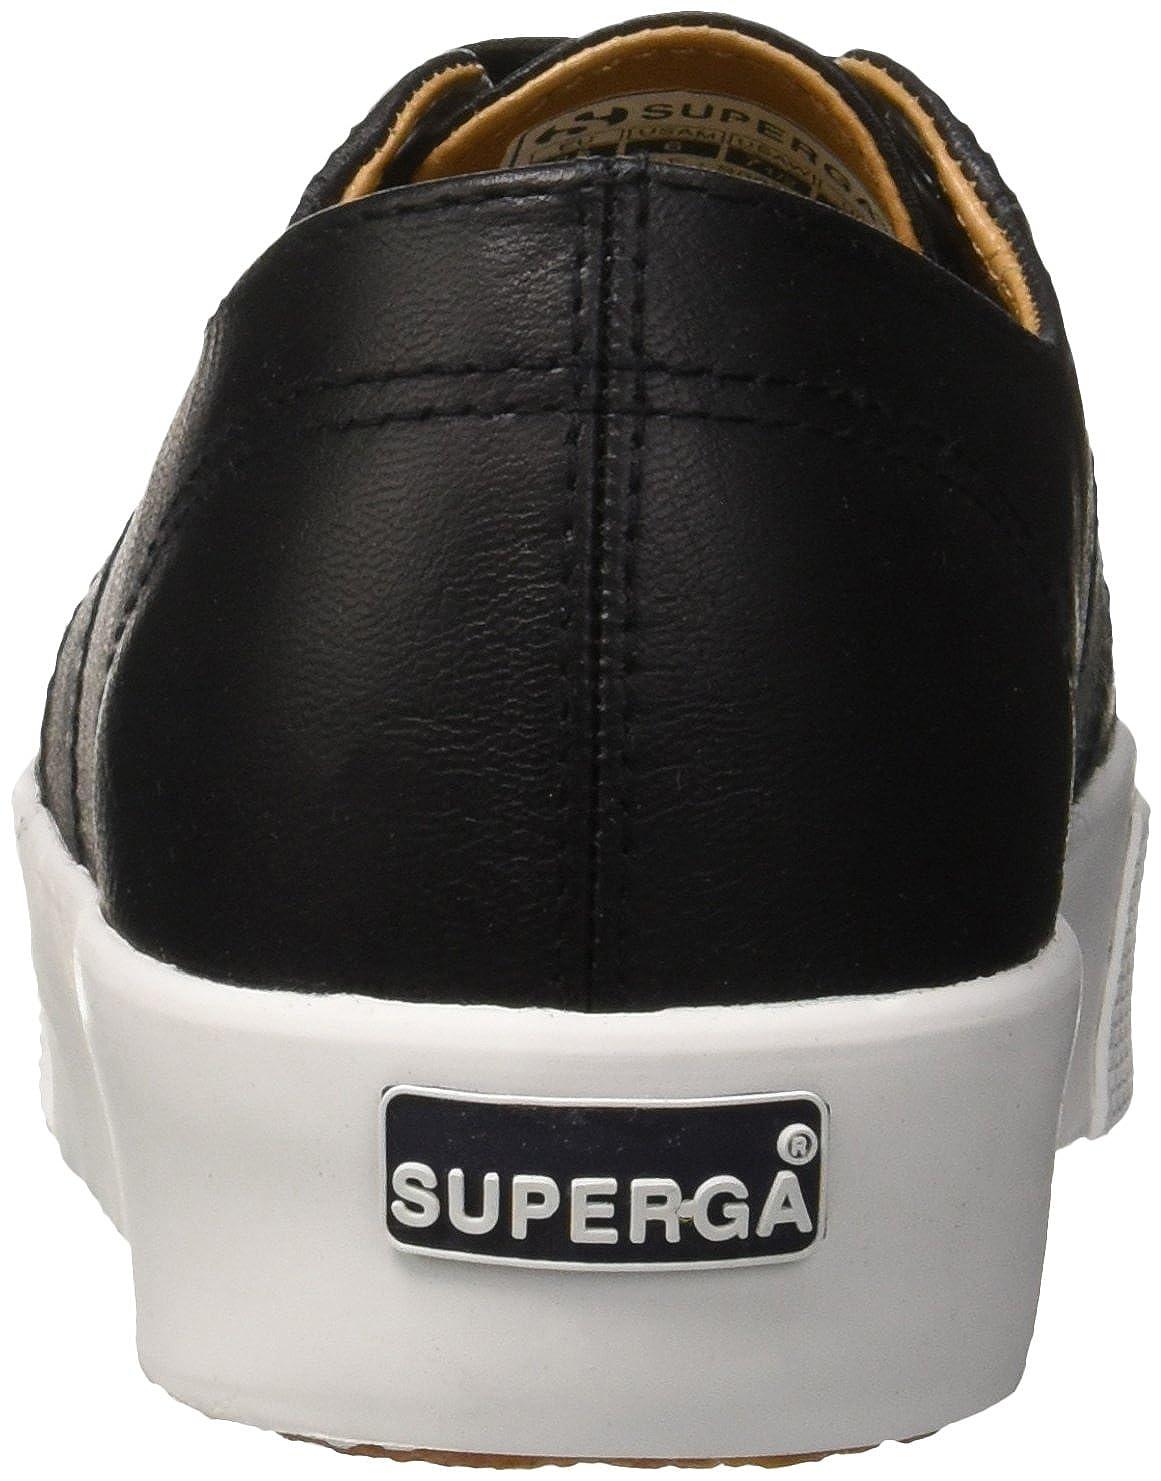 Superga Unisex Adults 2730 Nappaleau Trainers